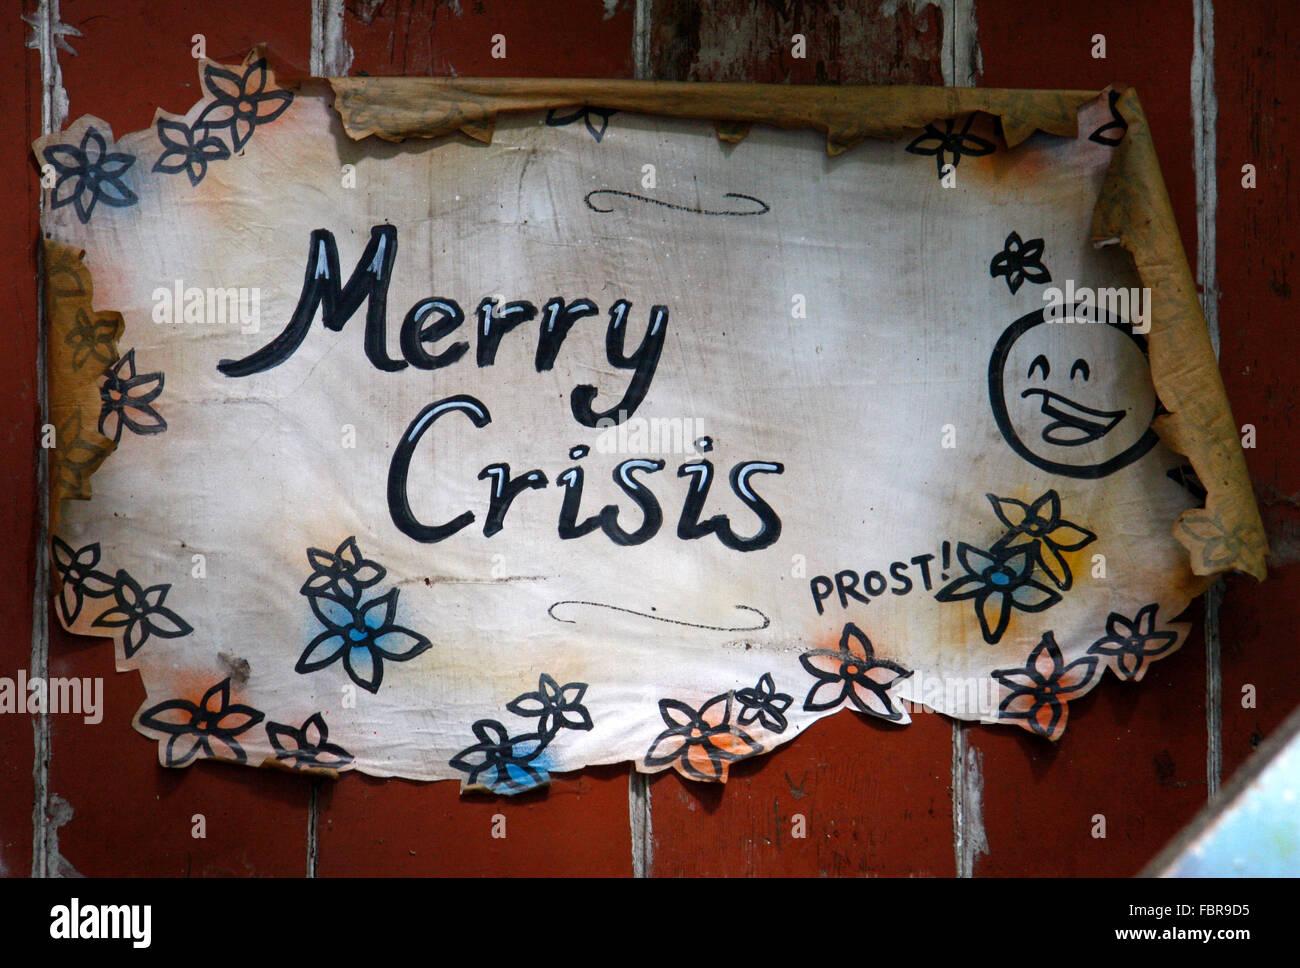 'Merry Crisis' - Wirtschaftskrise, Graffities, Berlin-Kreuzberg. - Stock Image